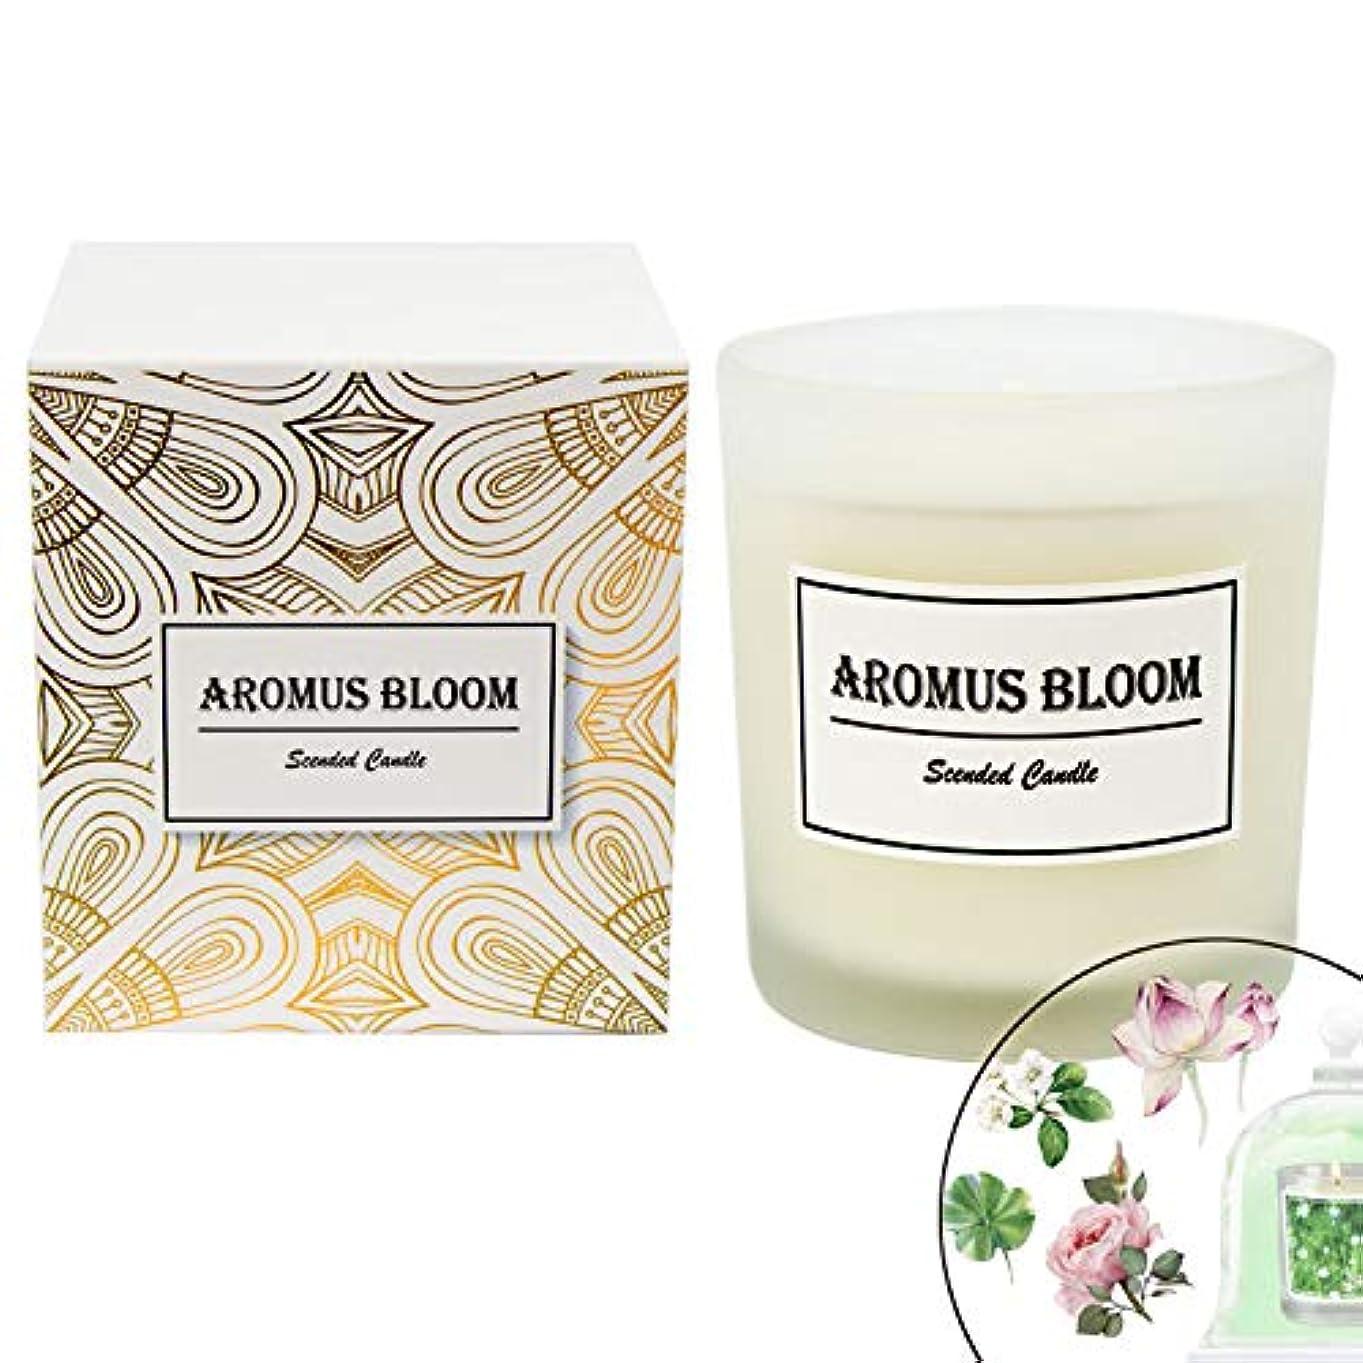 AromusBloom 香り付きキャンドル ギフト 天然エッセンシャルオイル 100% 環境に優しい大豆ワックス アロマセラピーキャンドル ギフトキャンドル レディース Green Lush B07D82D5S5